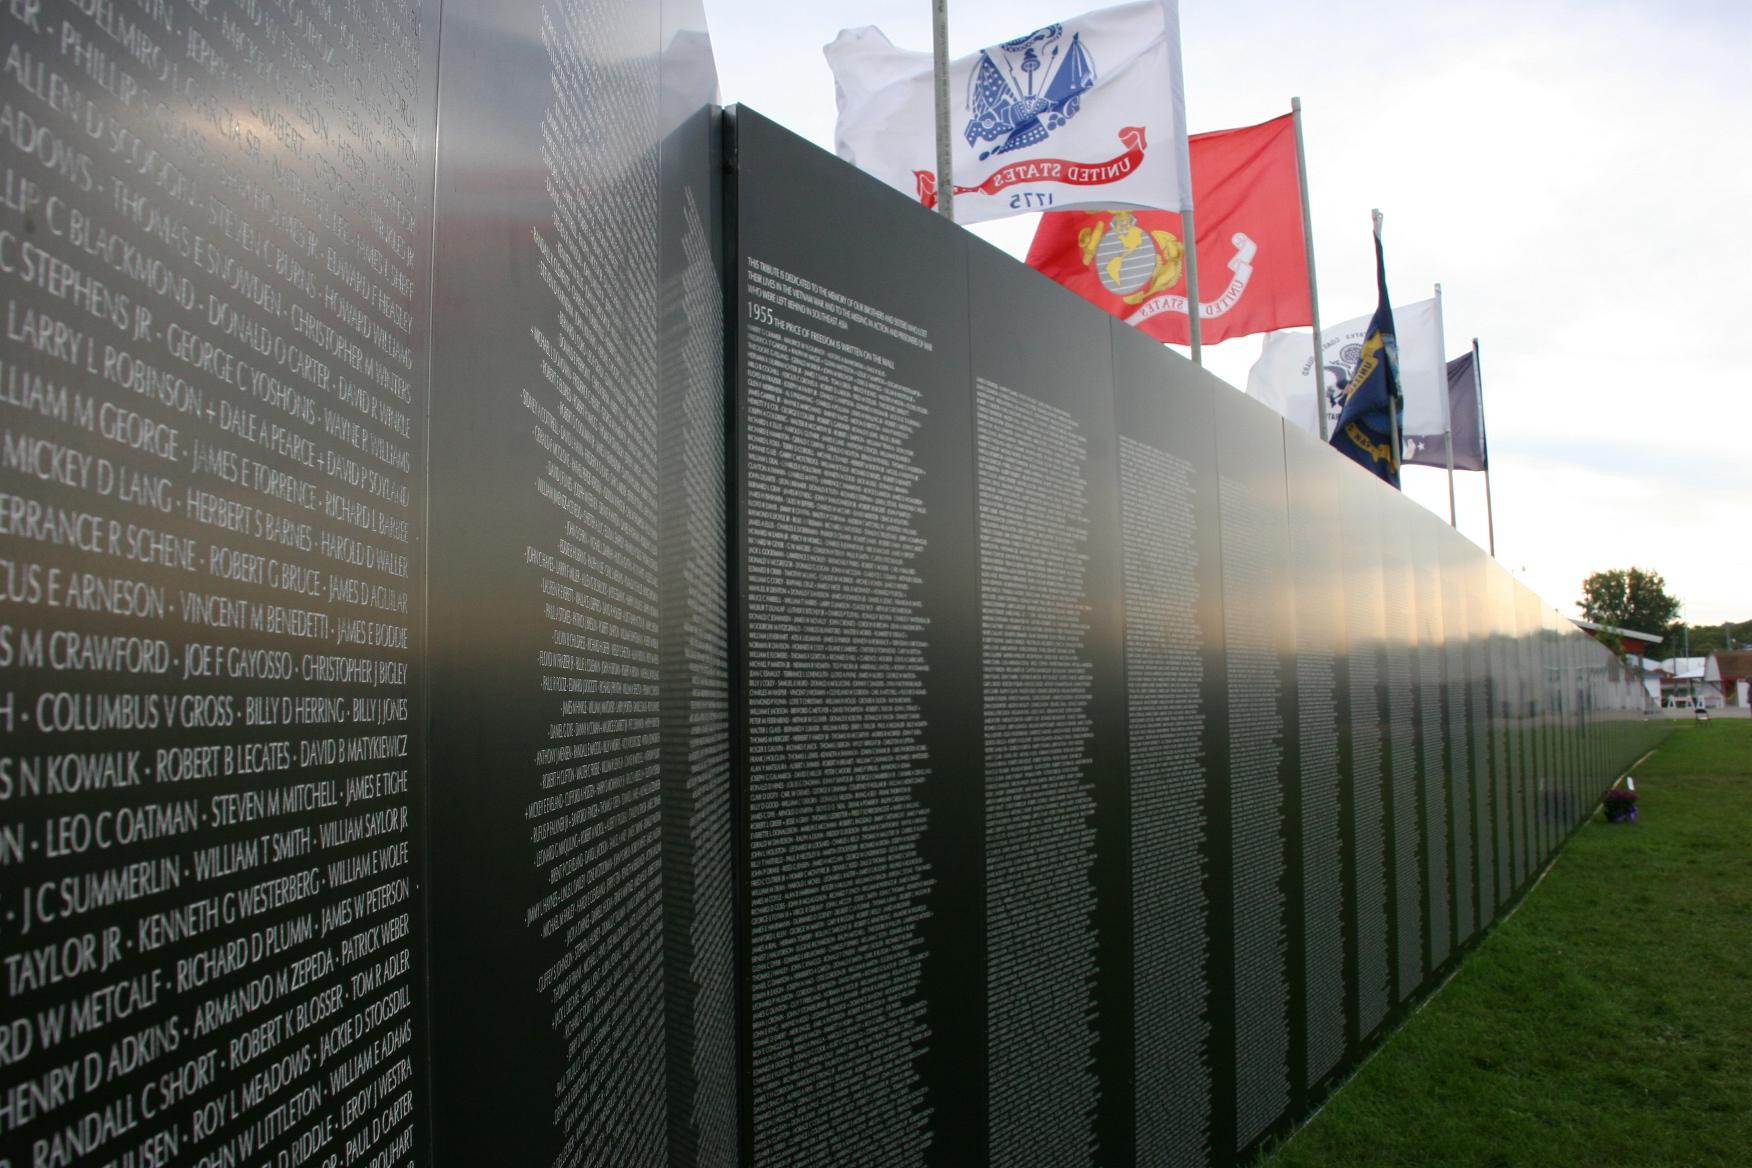 Vietnam Wall 22 Wall Panels Flags Minnesota Prairie Roots